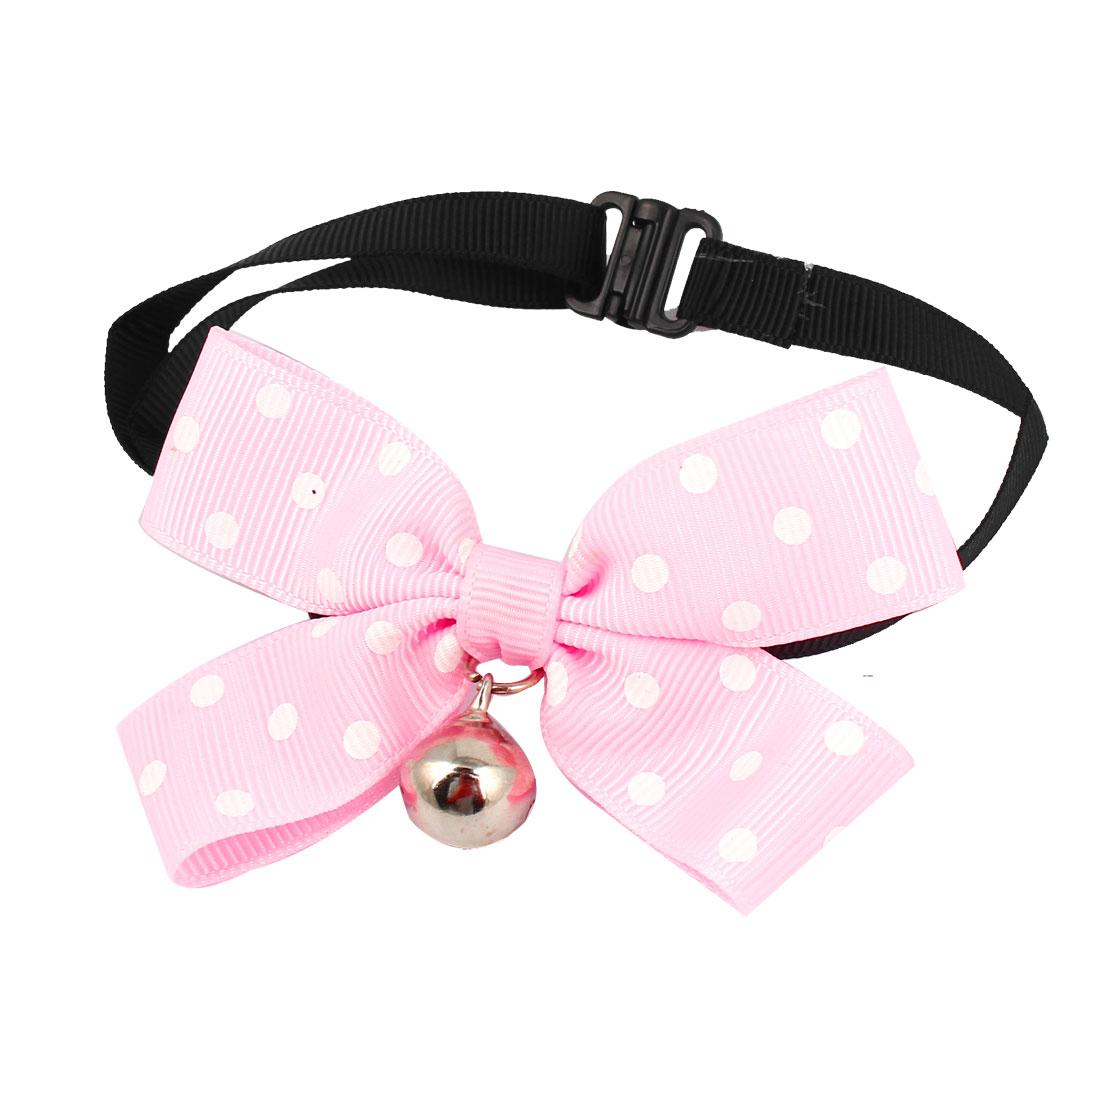 Metal Bell Pendant Bowtie Accent Pet Dog Adjustable Belt Collar Necklace Pink Black